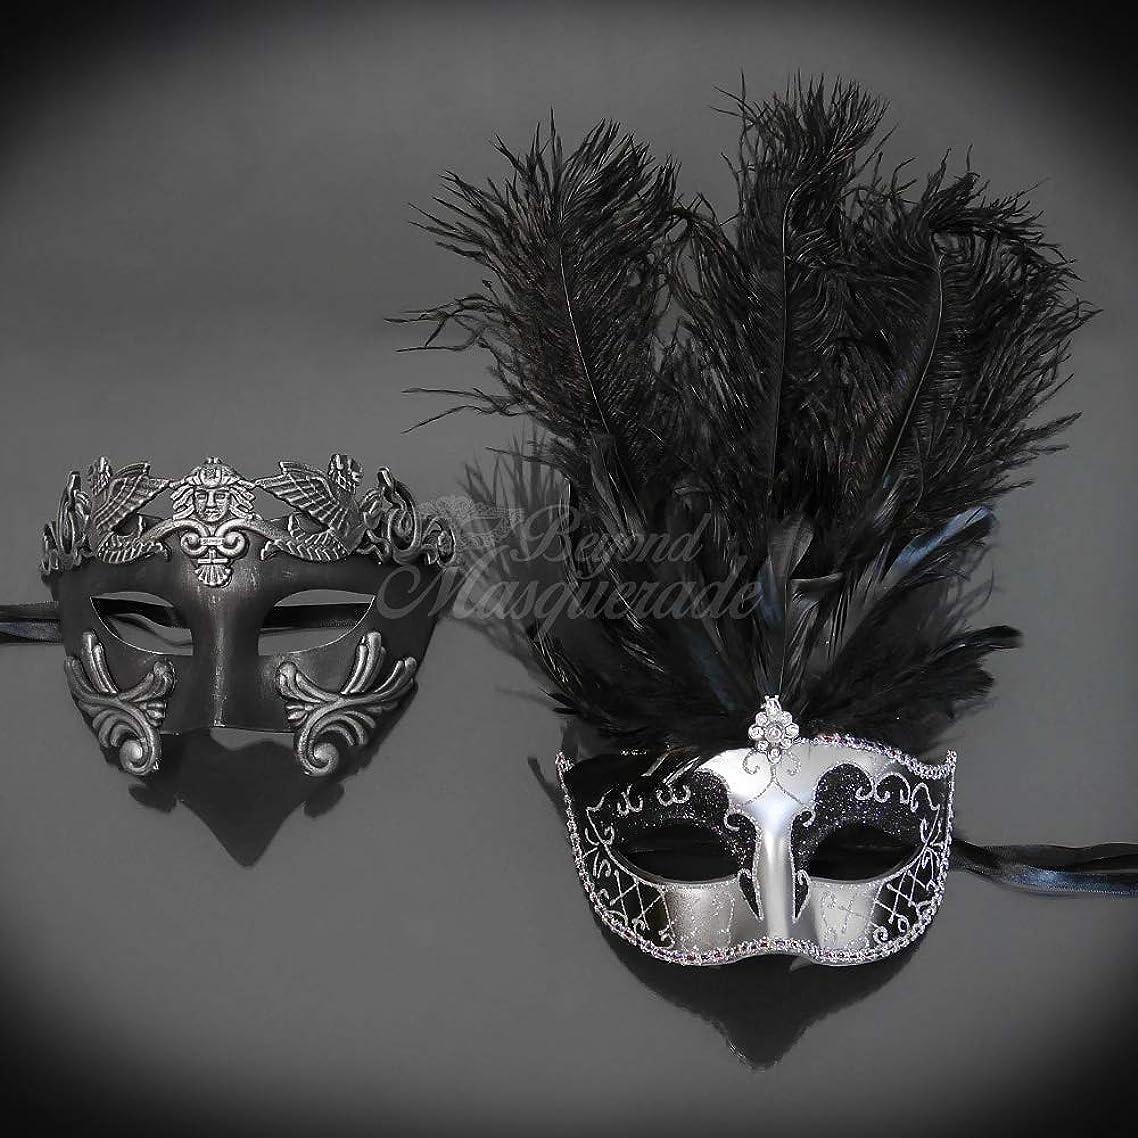 Masquerade Couples Venetian Impression Elegantly Design Masks - A Set of 2 Peices